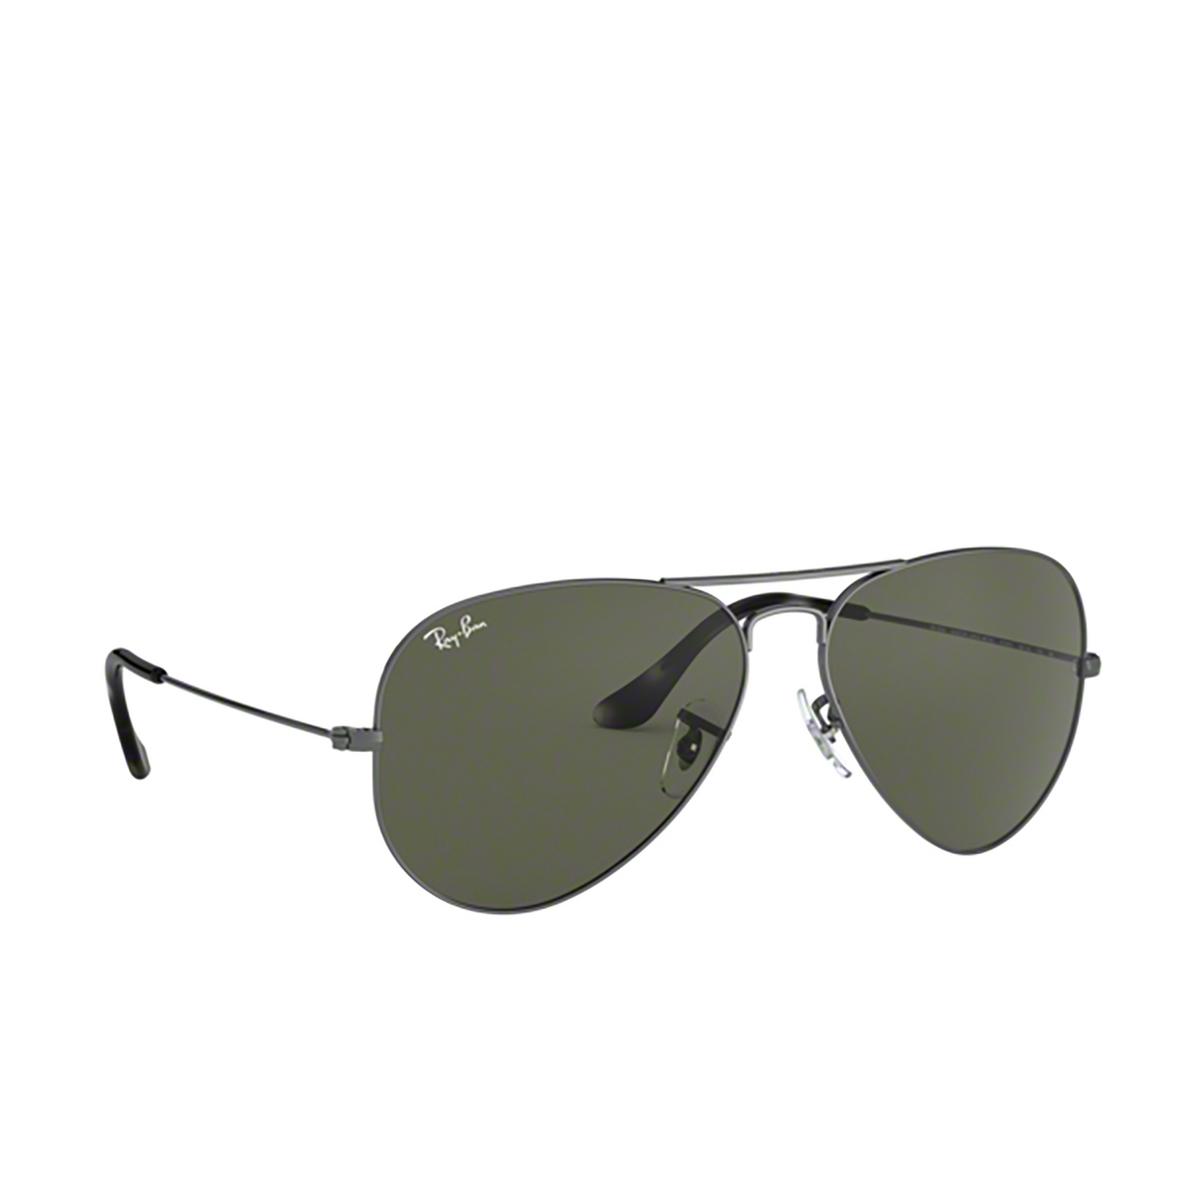 Ray-Ban® Aviator Sunglasses: Aviator Large Metal RB3025 color Sand Transparent Grey 919031 - three-quarters view.